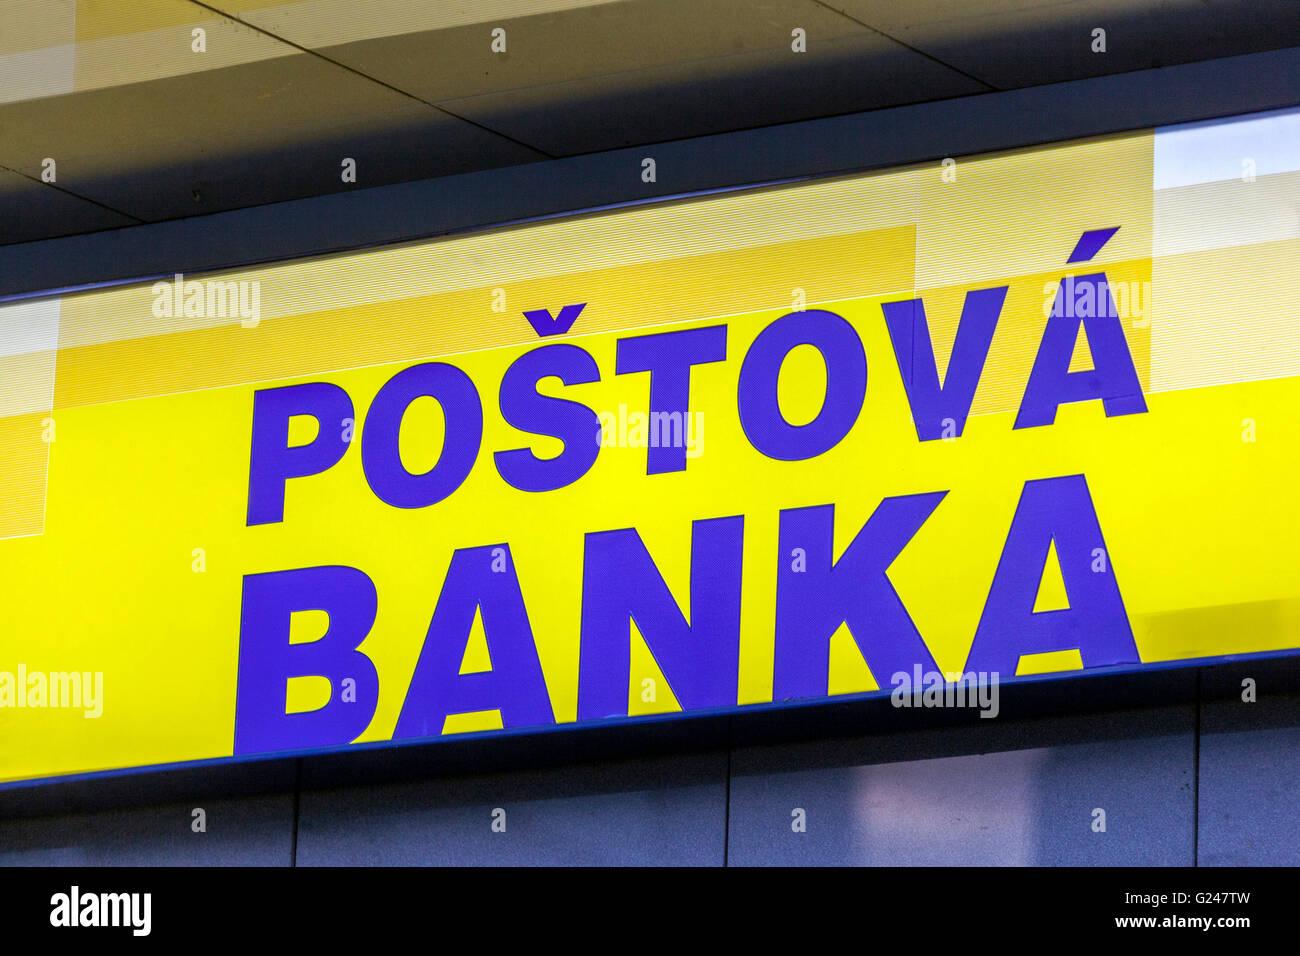 Signo Postova Banka, Eslovaquia, Europa Foto de stock